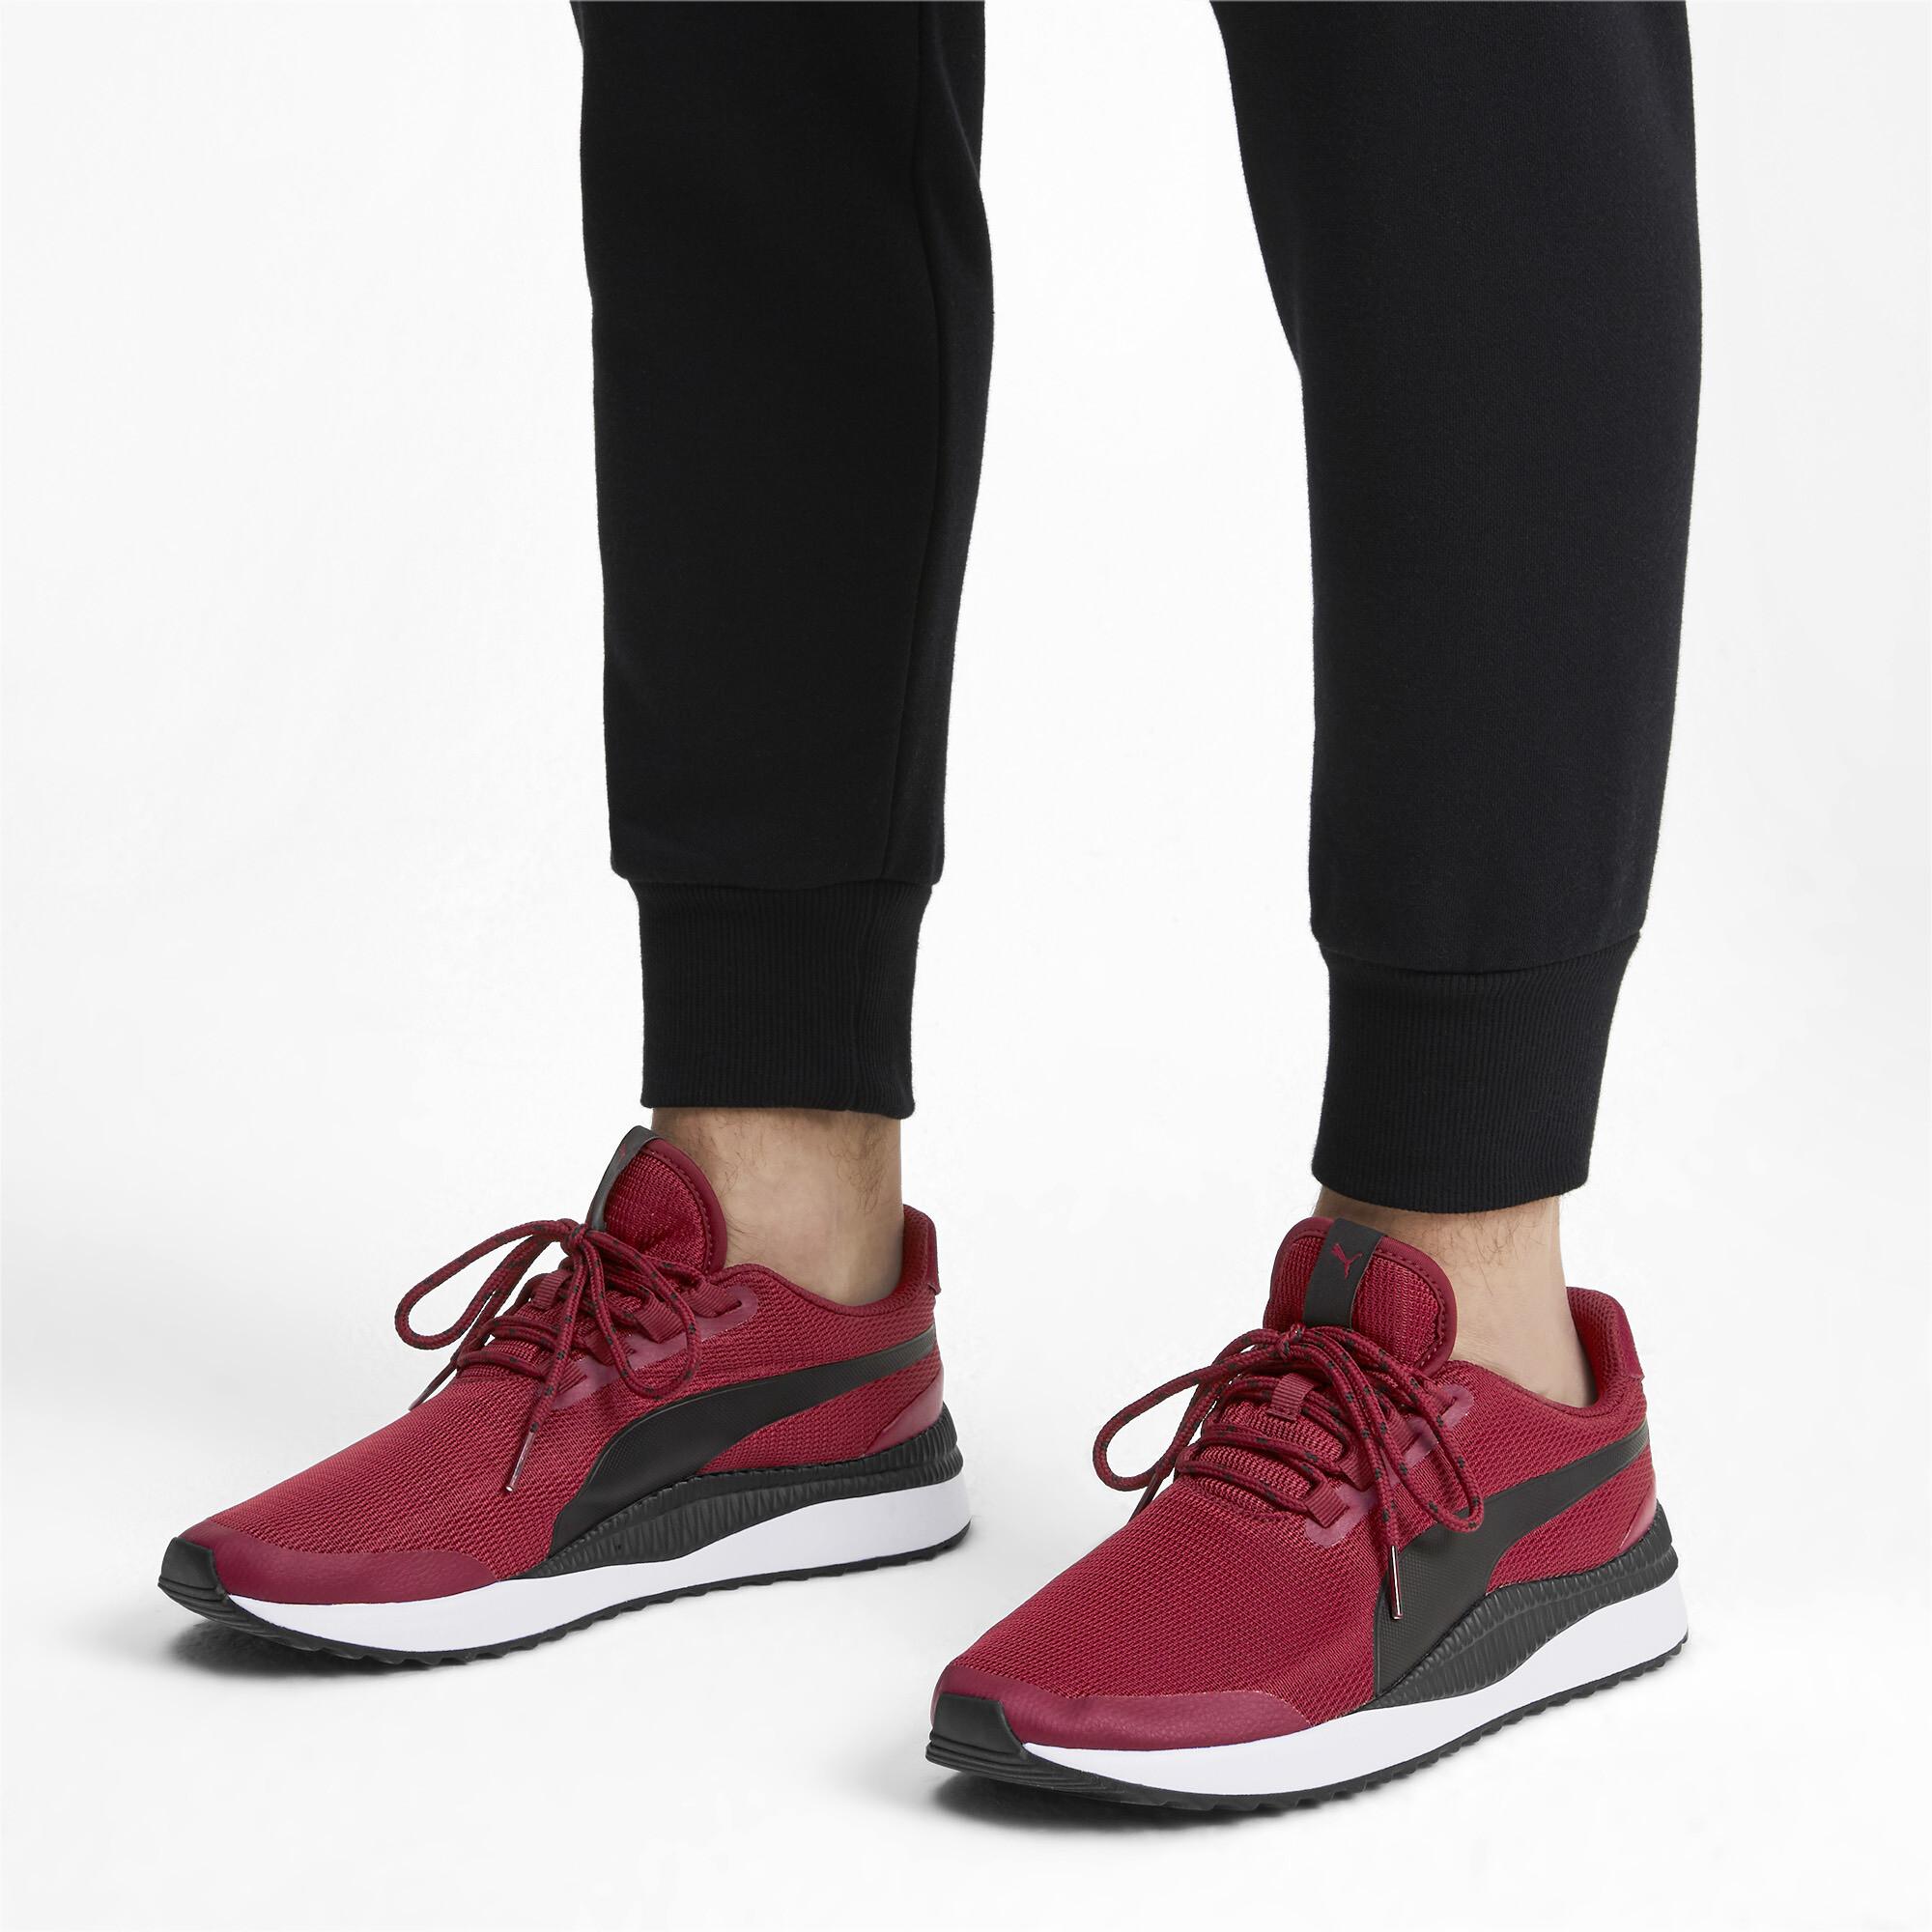 PUMA-Pacer-Next-FS-Men-039-s-Sneakers-Unisex-Shoe-Basics thumbnail 11